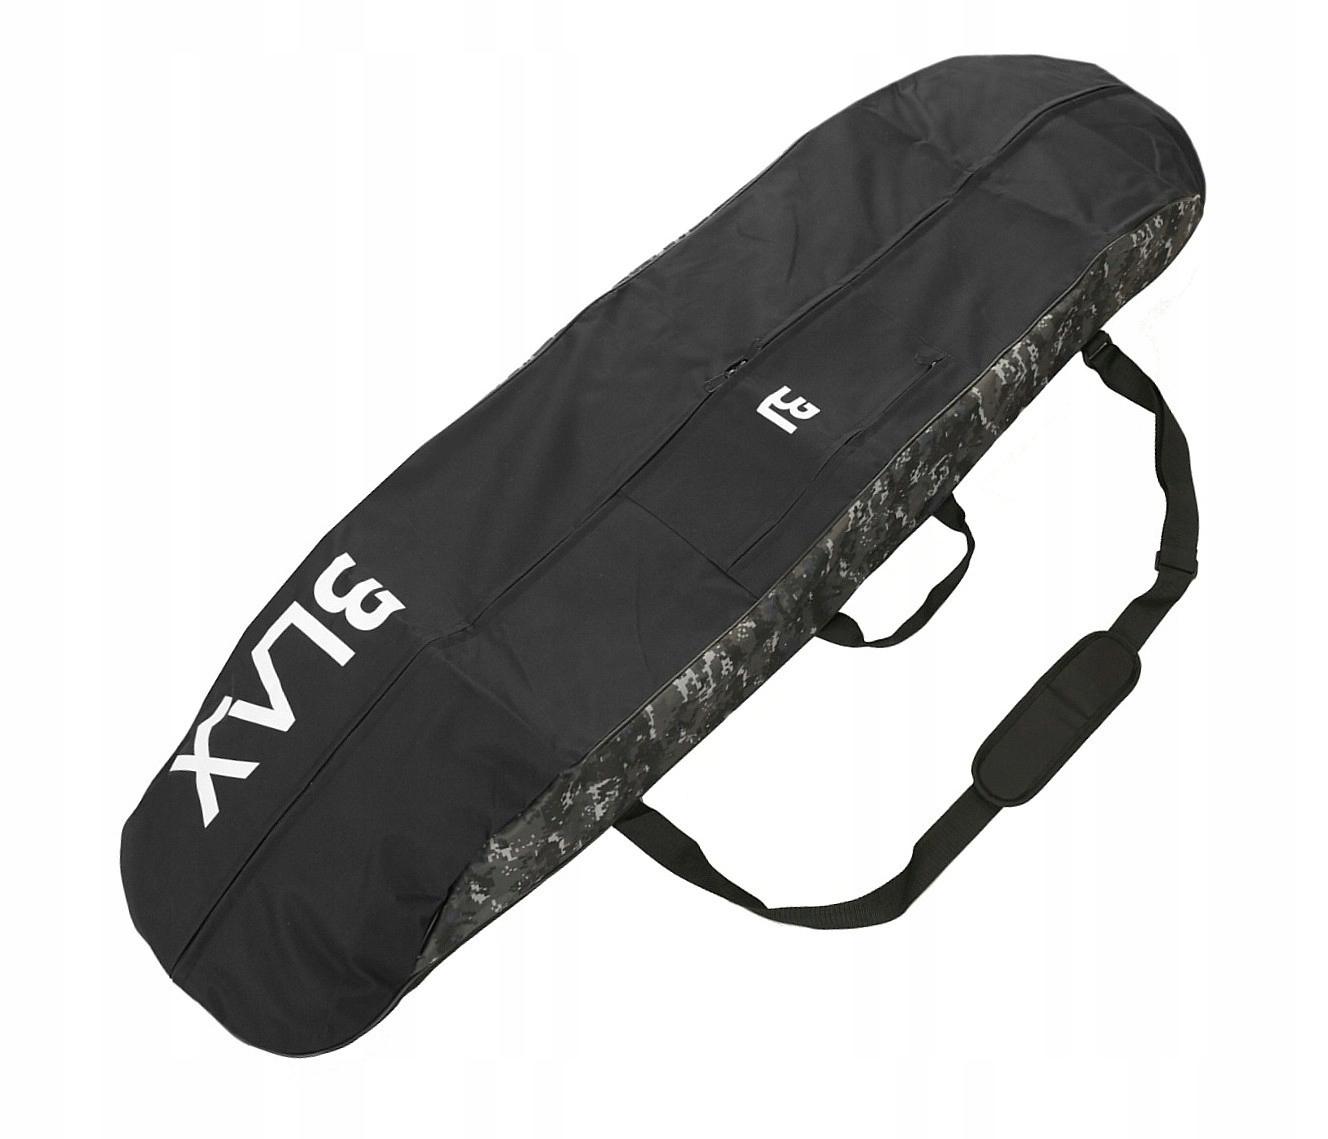 obal na snowboard BLAX Ikona - Black/Camo